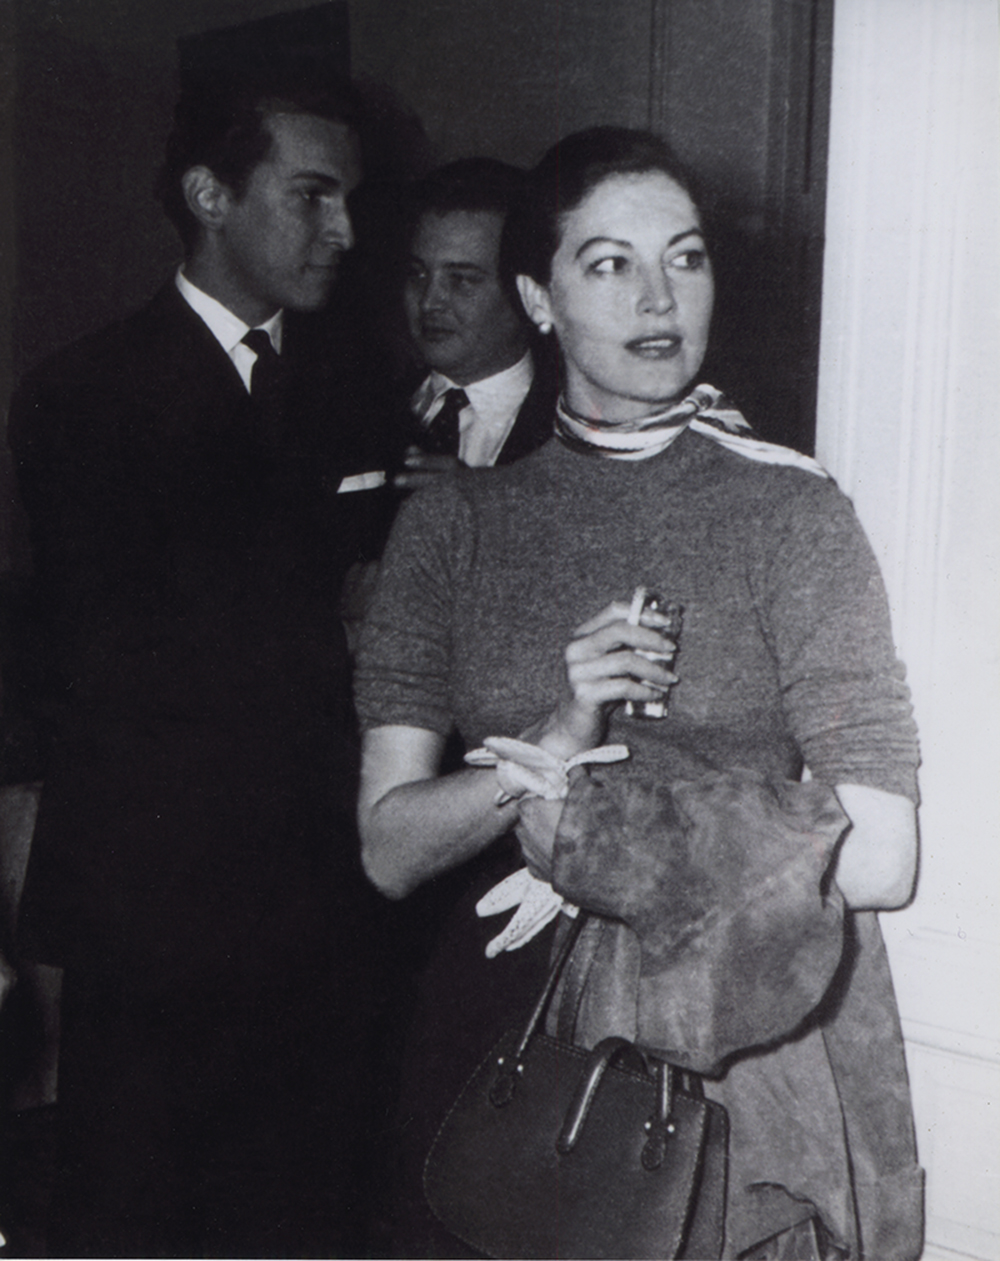 Oscar and Ava Gardner in spain.